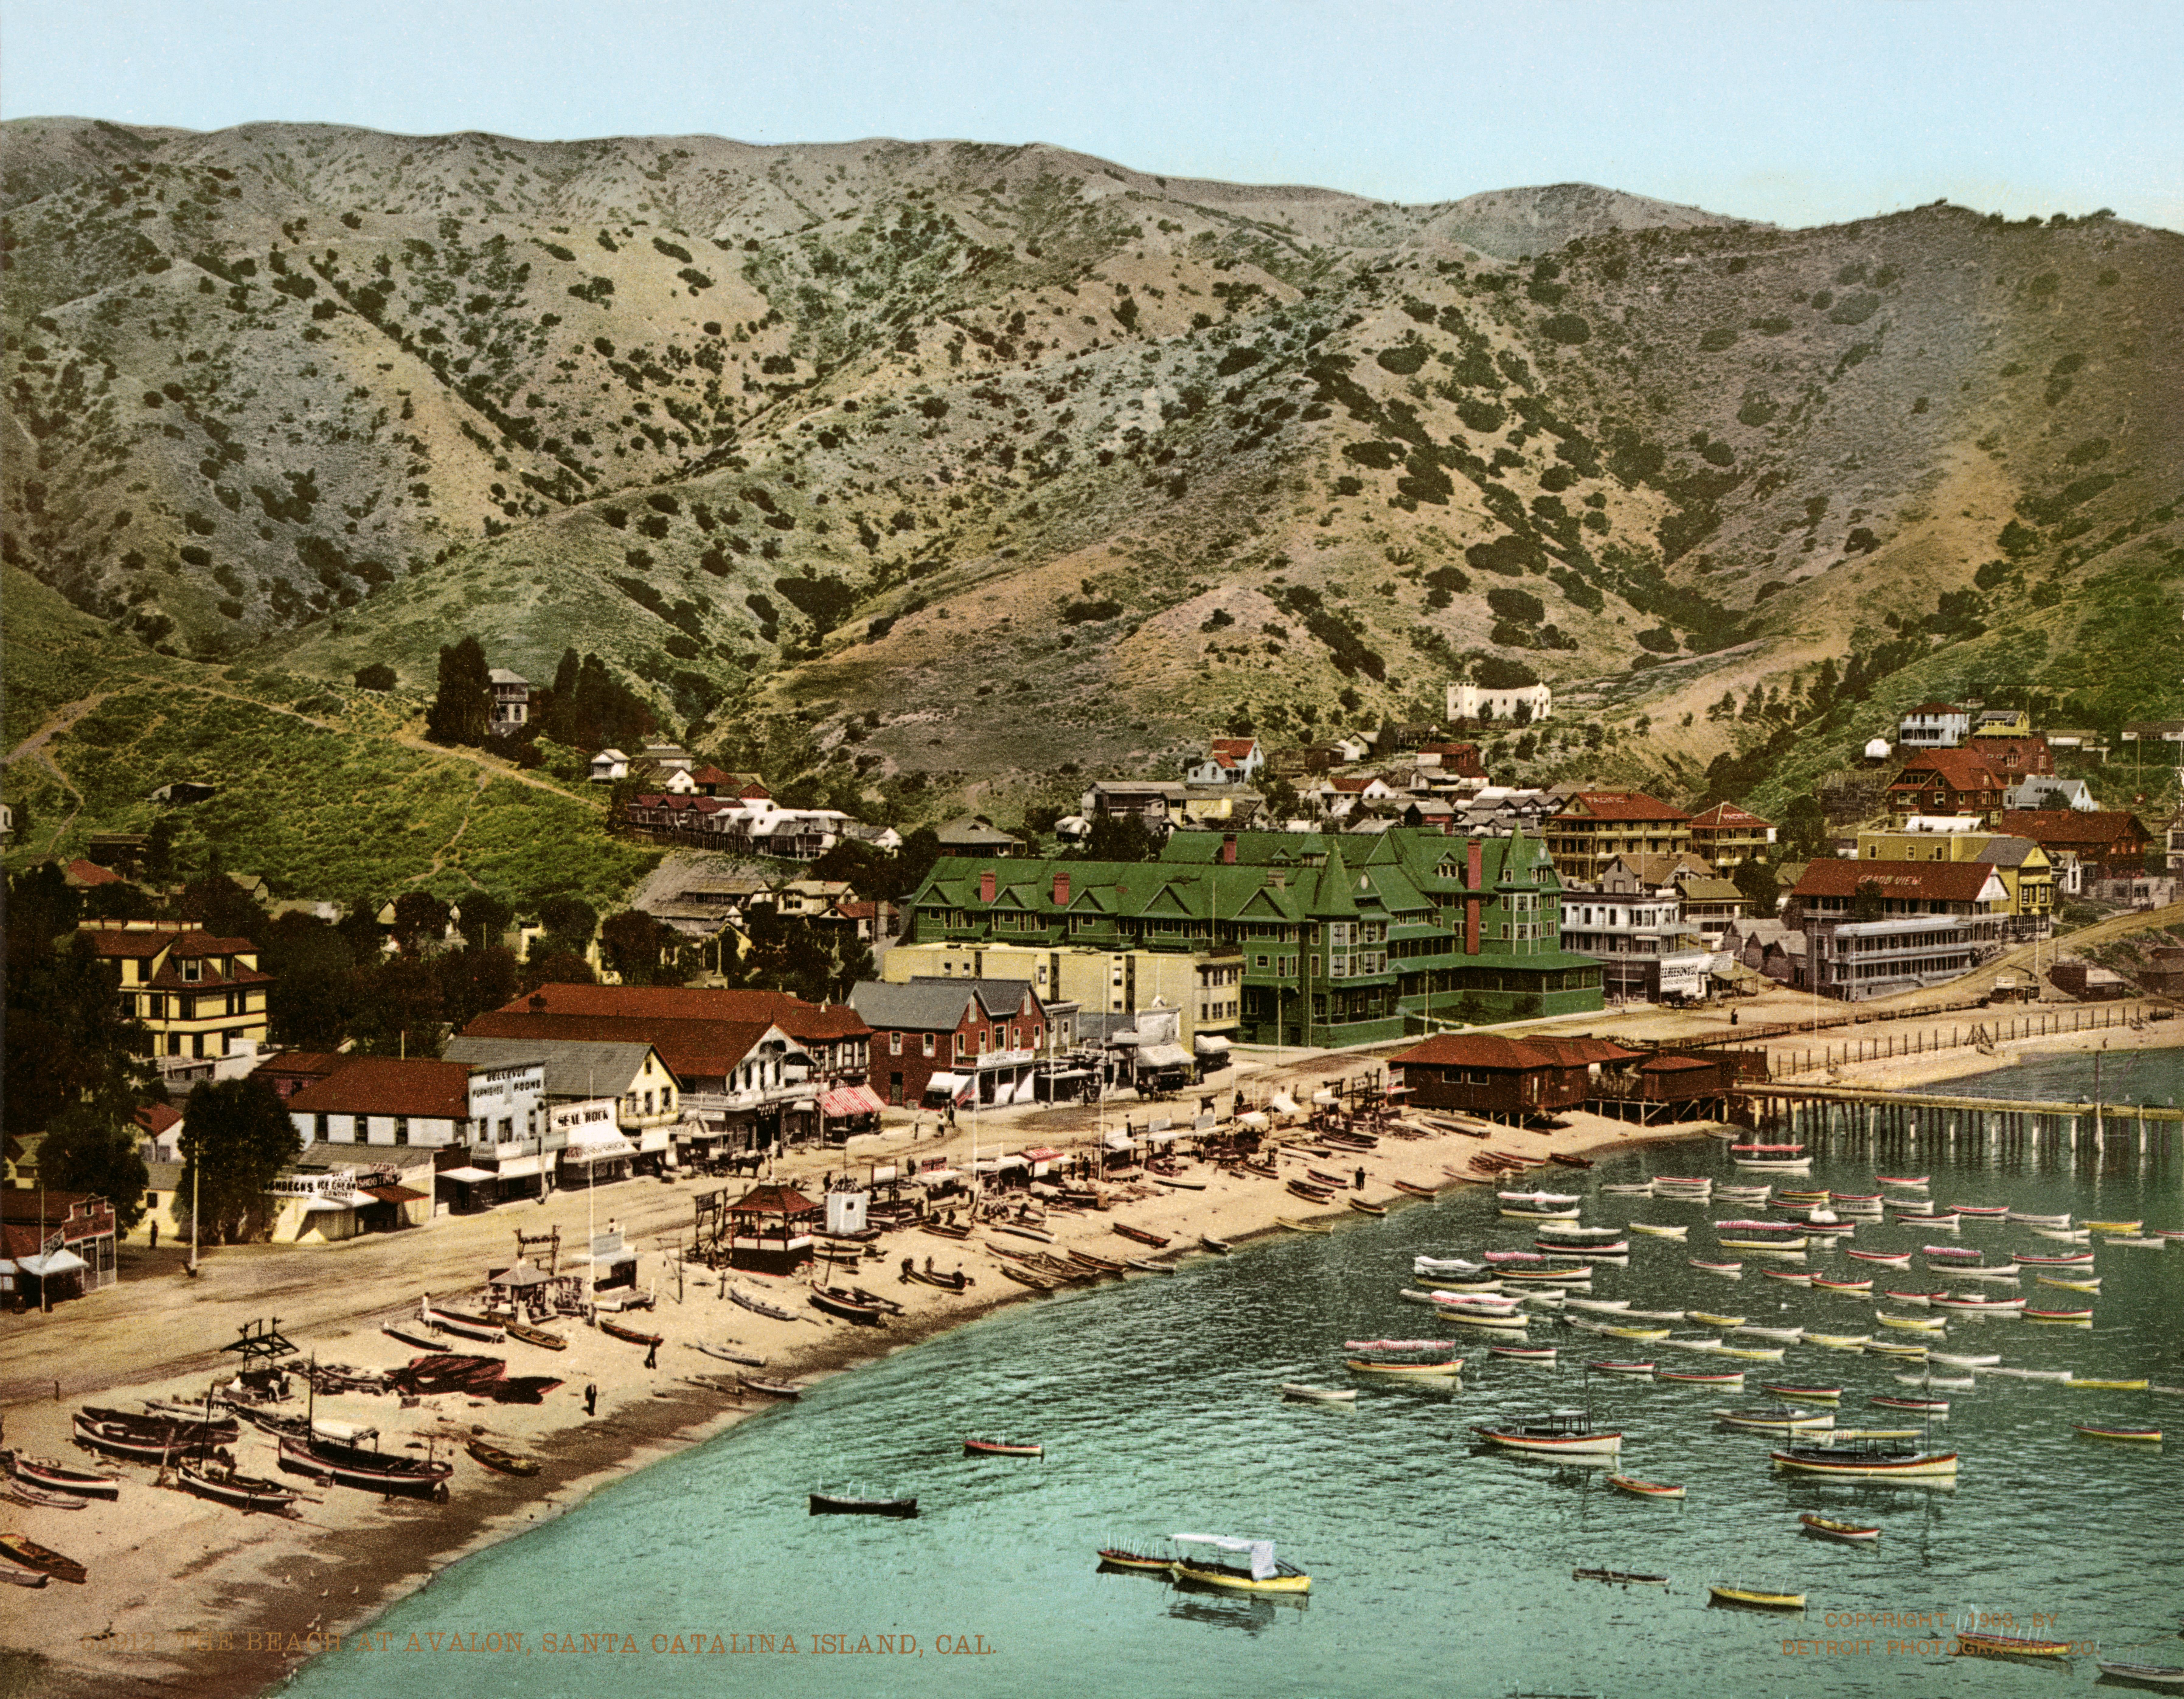 Catalina Island Avalon Restaurants